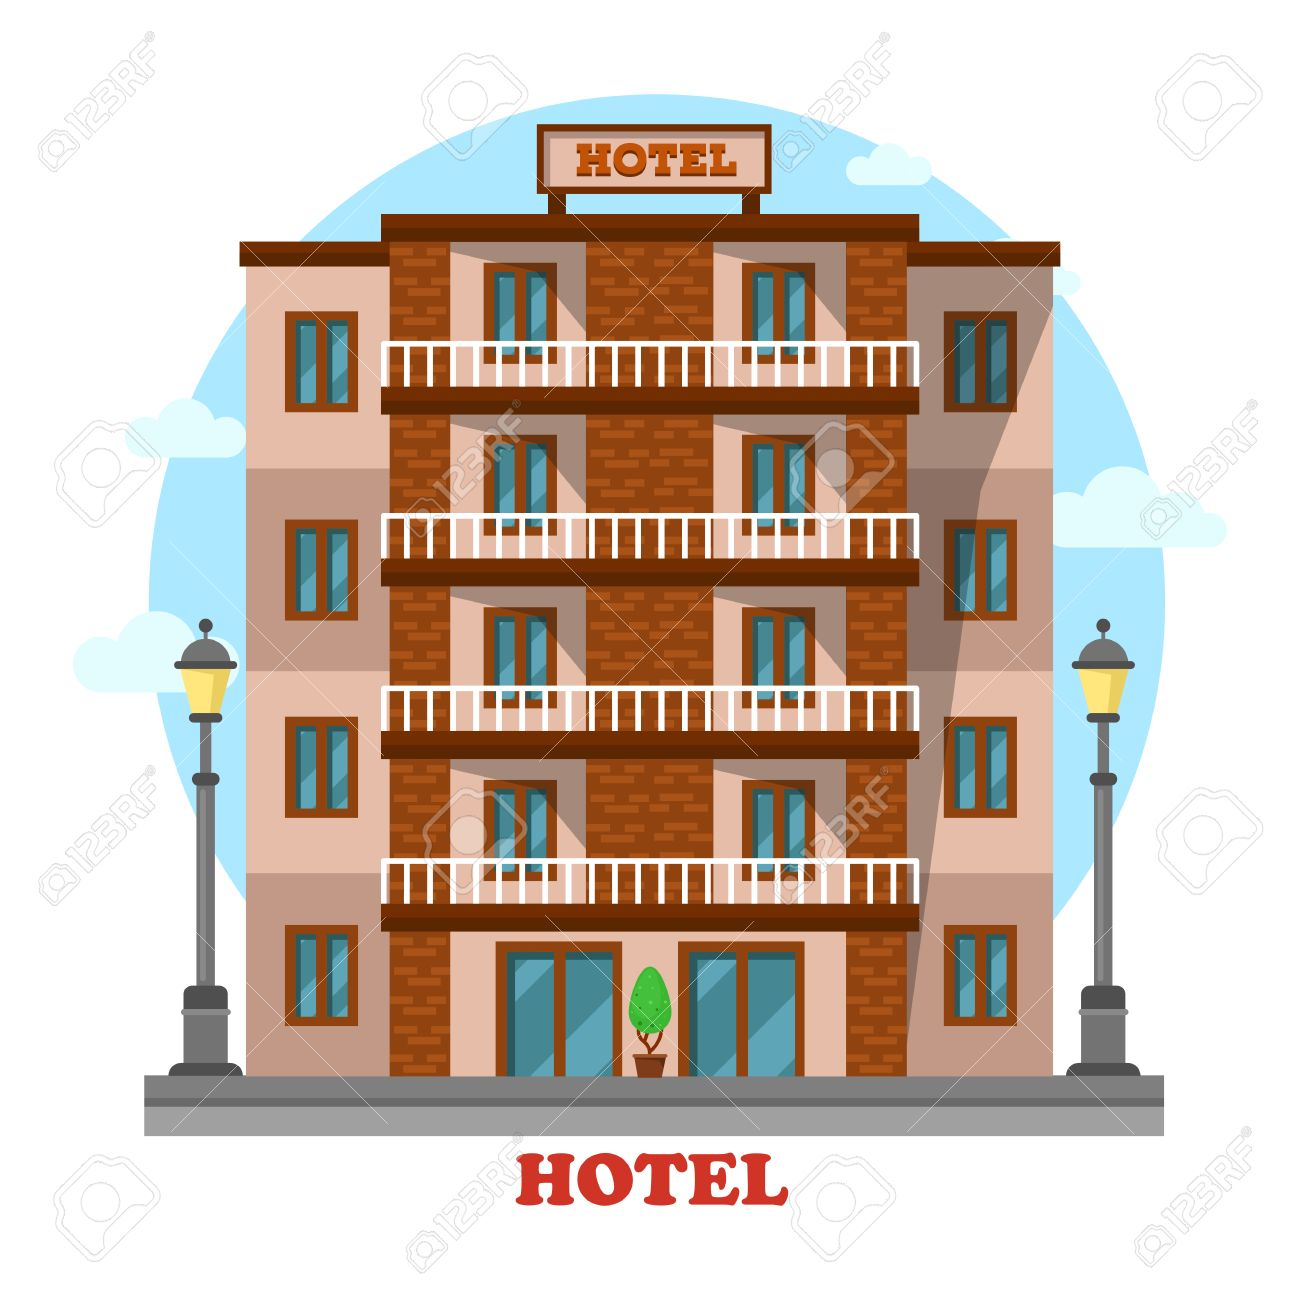 Hotel Or Motel Skyscraper Hostel Building Exterior View